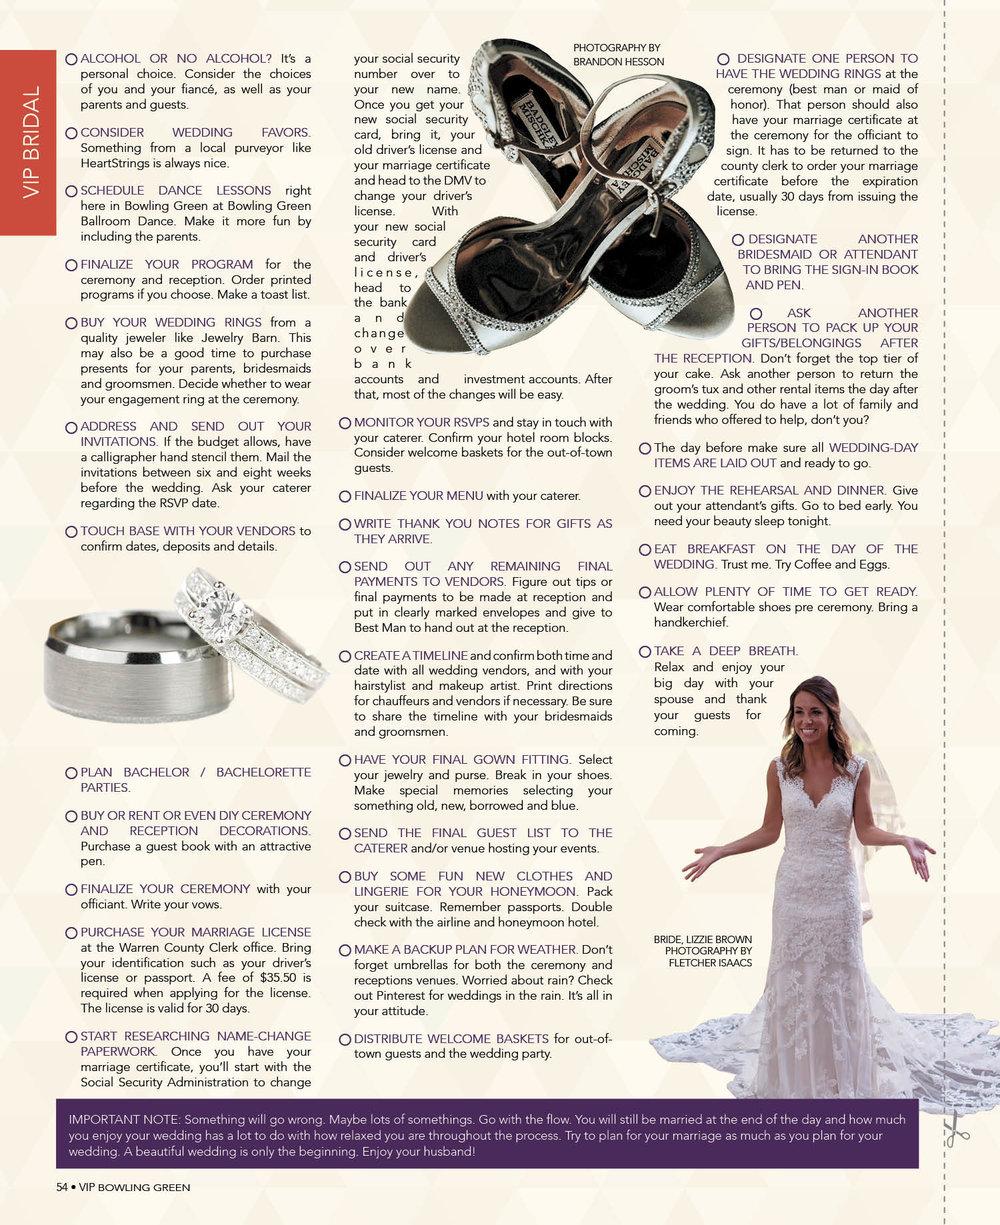 Wedding_Checklist_small2.jpg